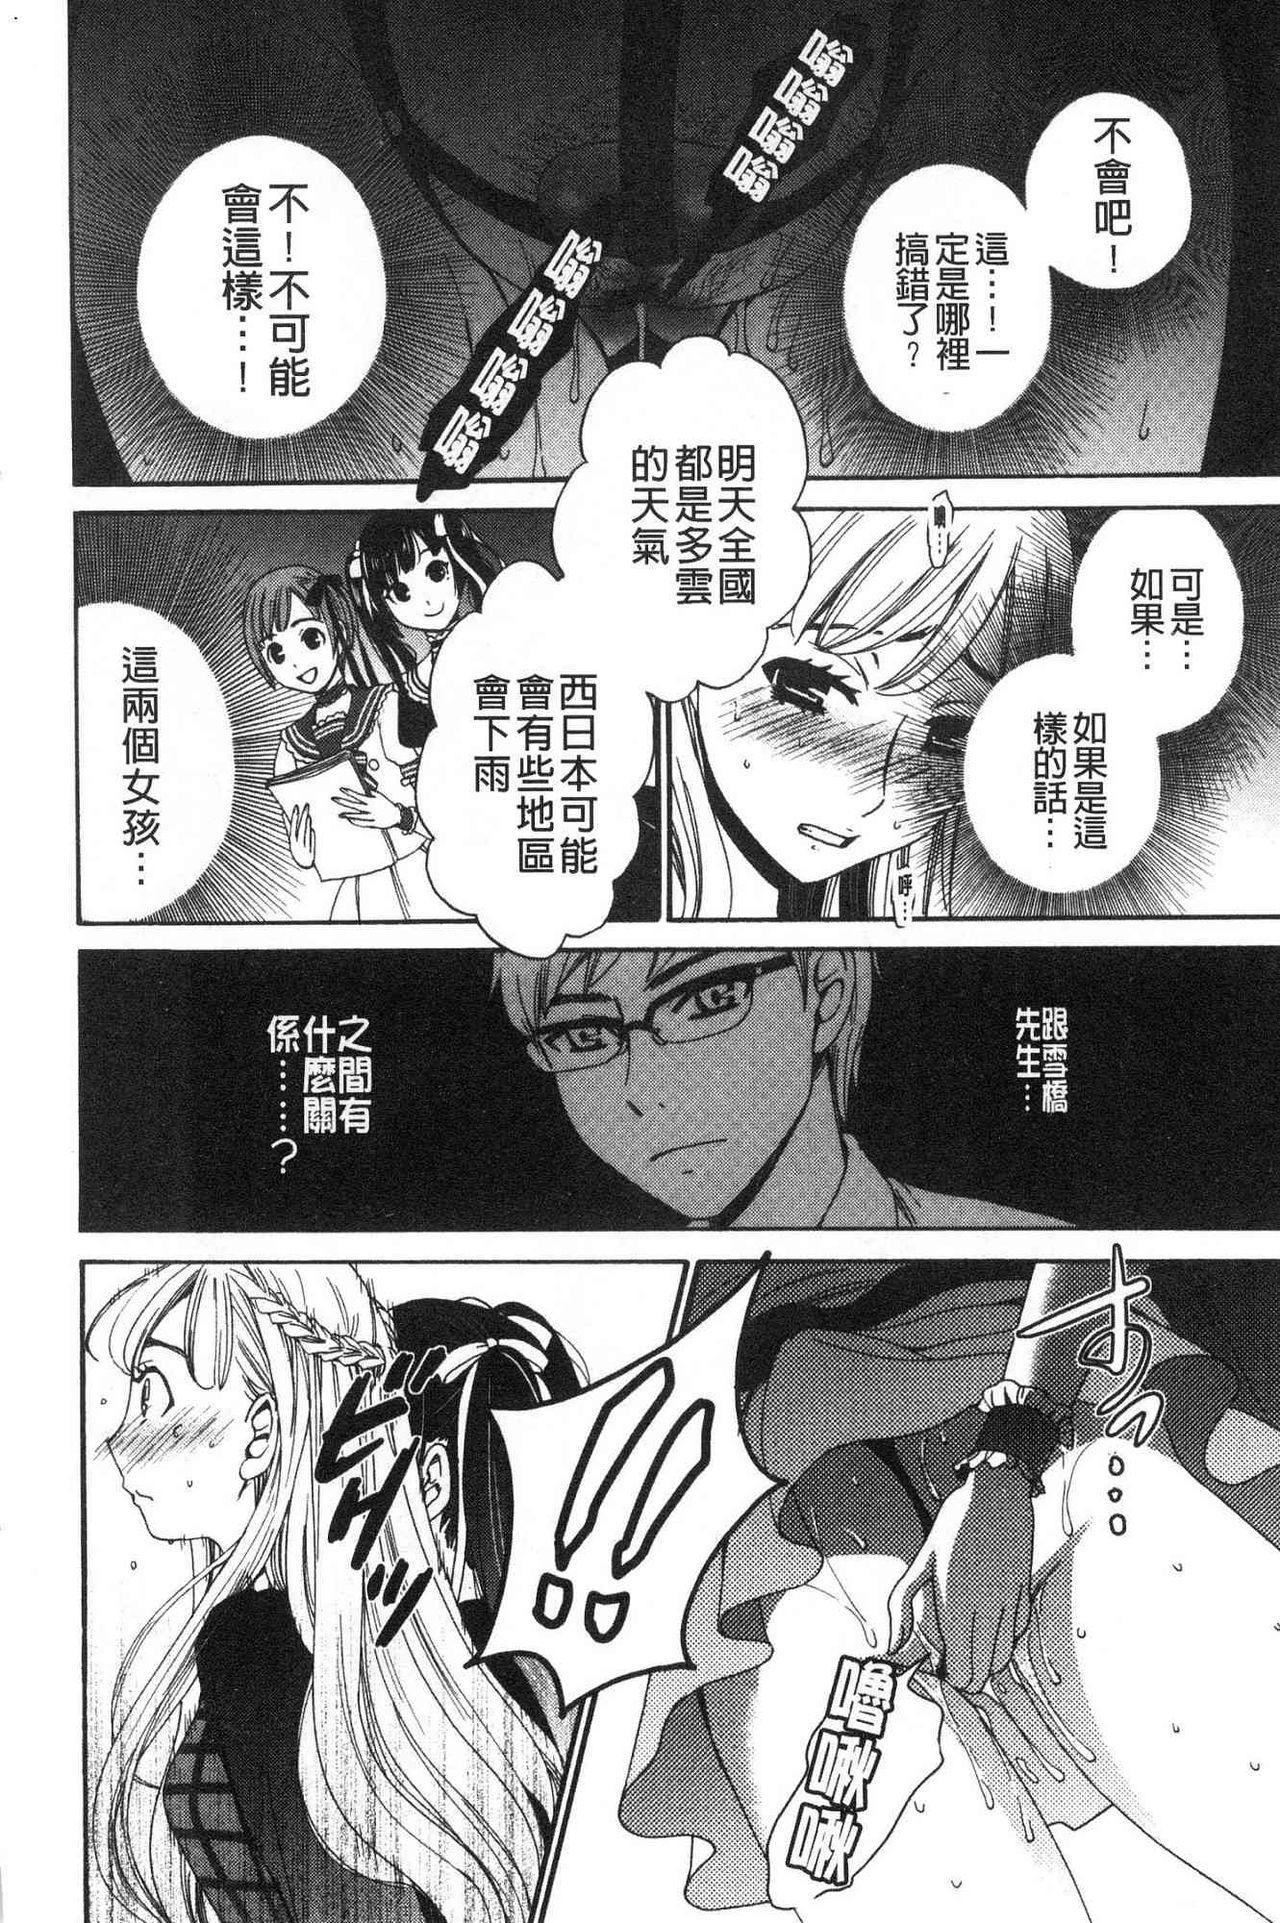 [Gotoh Akira]  21-ji no Onna ~Camera no Mae no Mesuinu~ 2 | 21時之女 ~鏡頭前的牝犬~ 2 [Chinese] 47